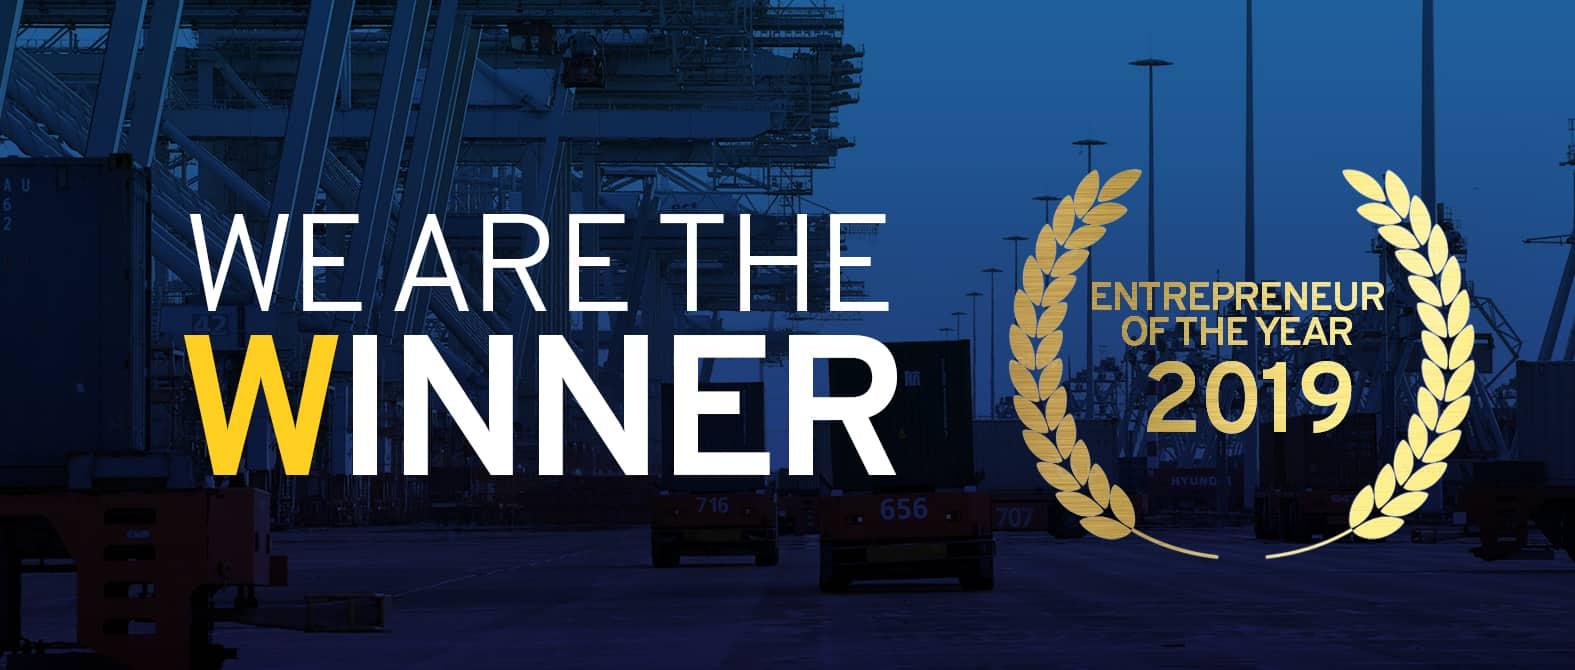 Stinis Holland B.V. wins entrepreneur of the year!